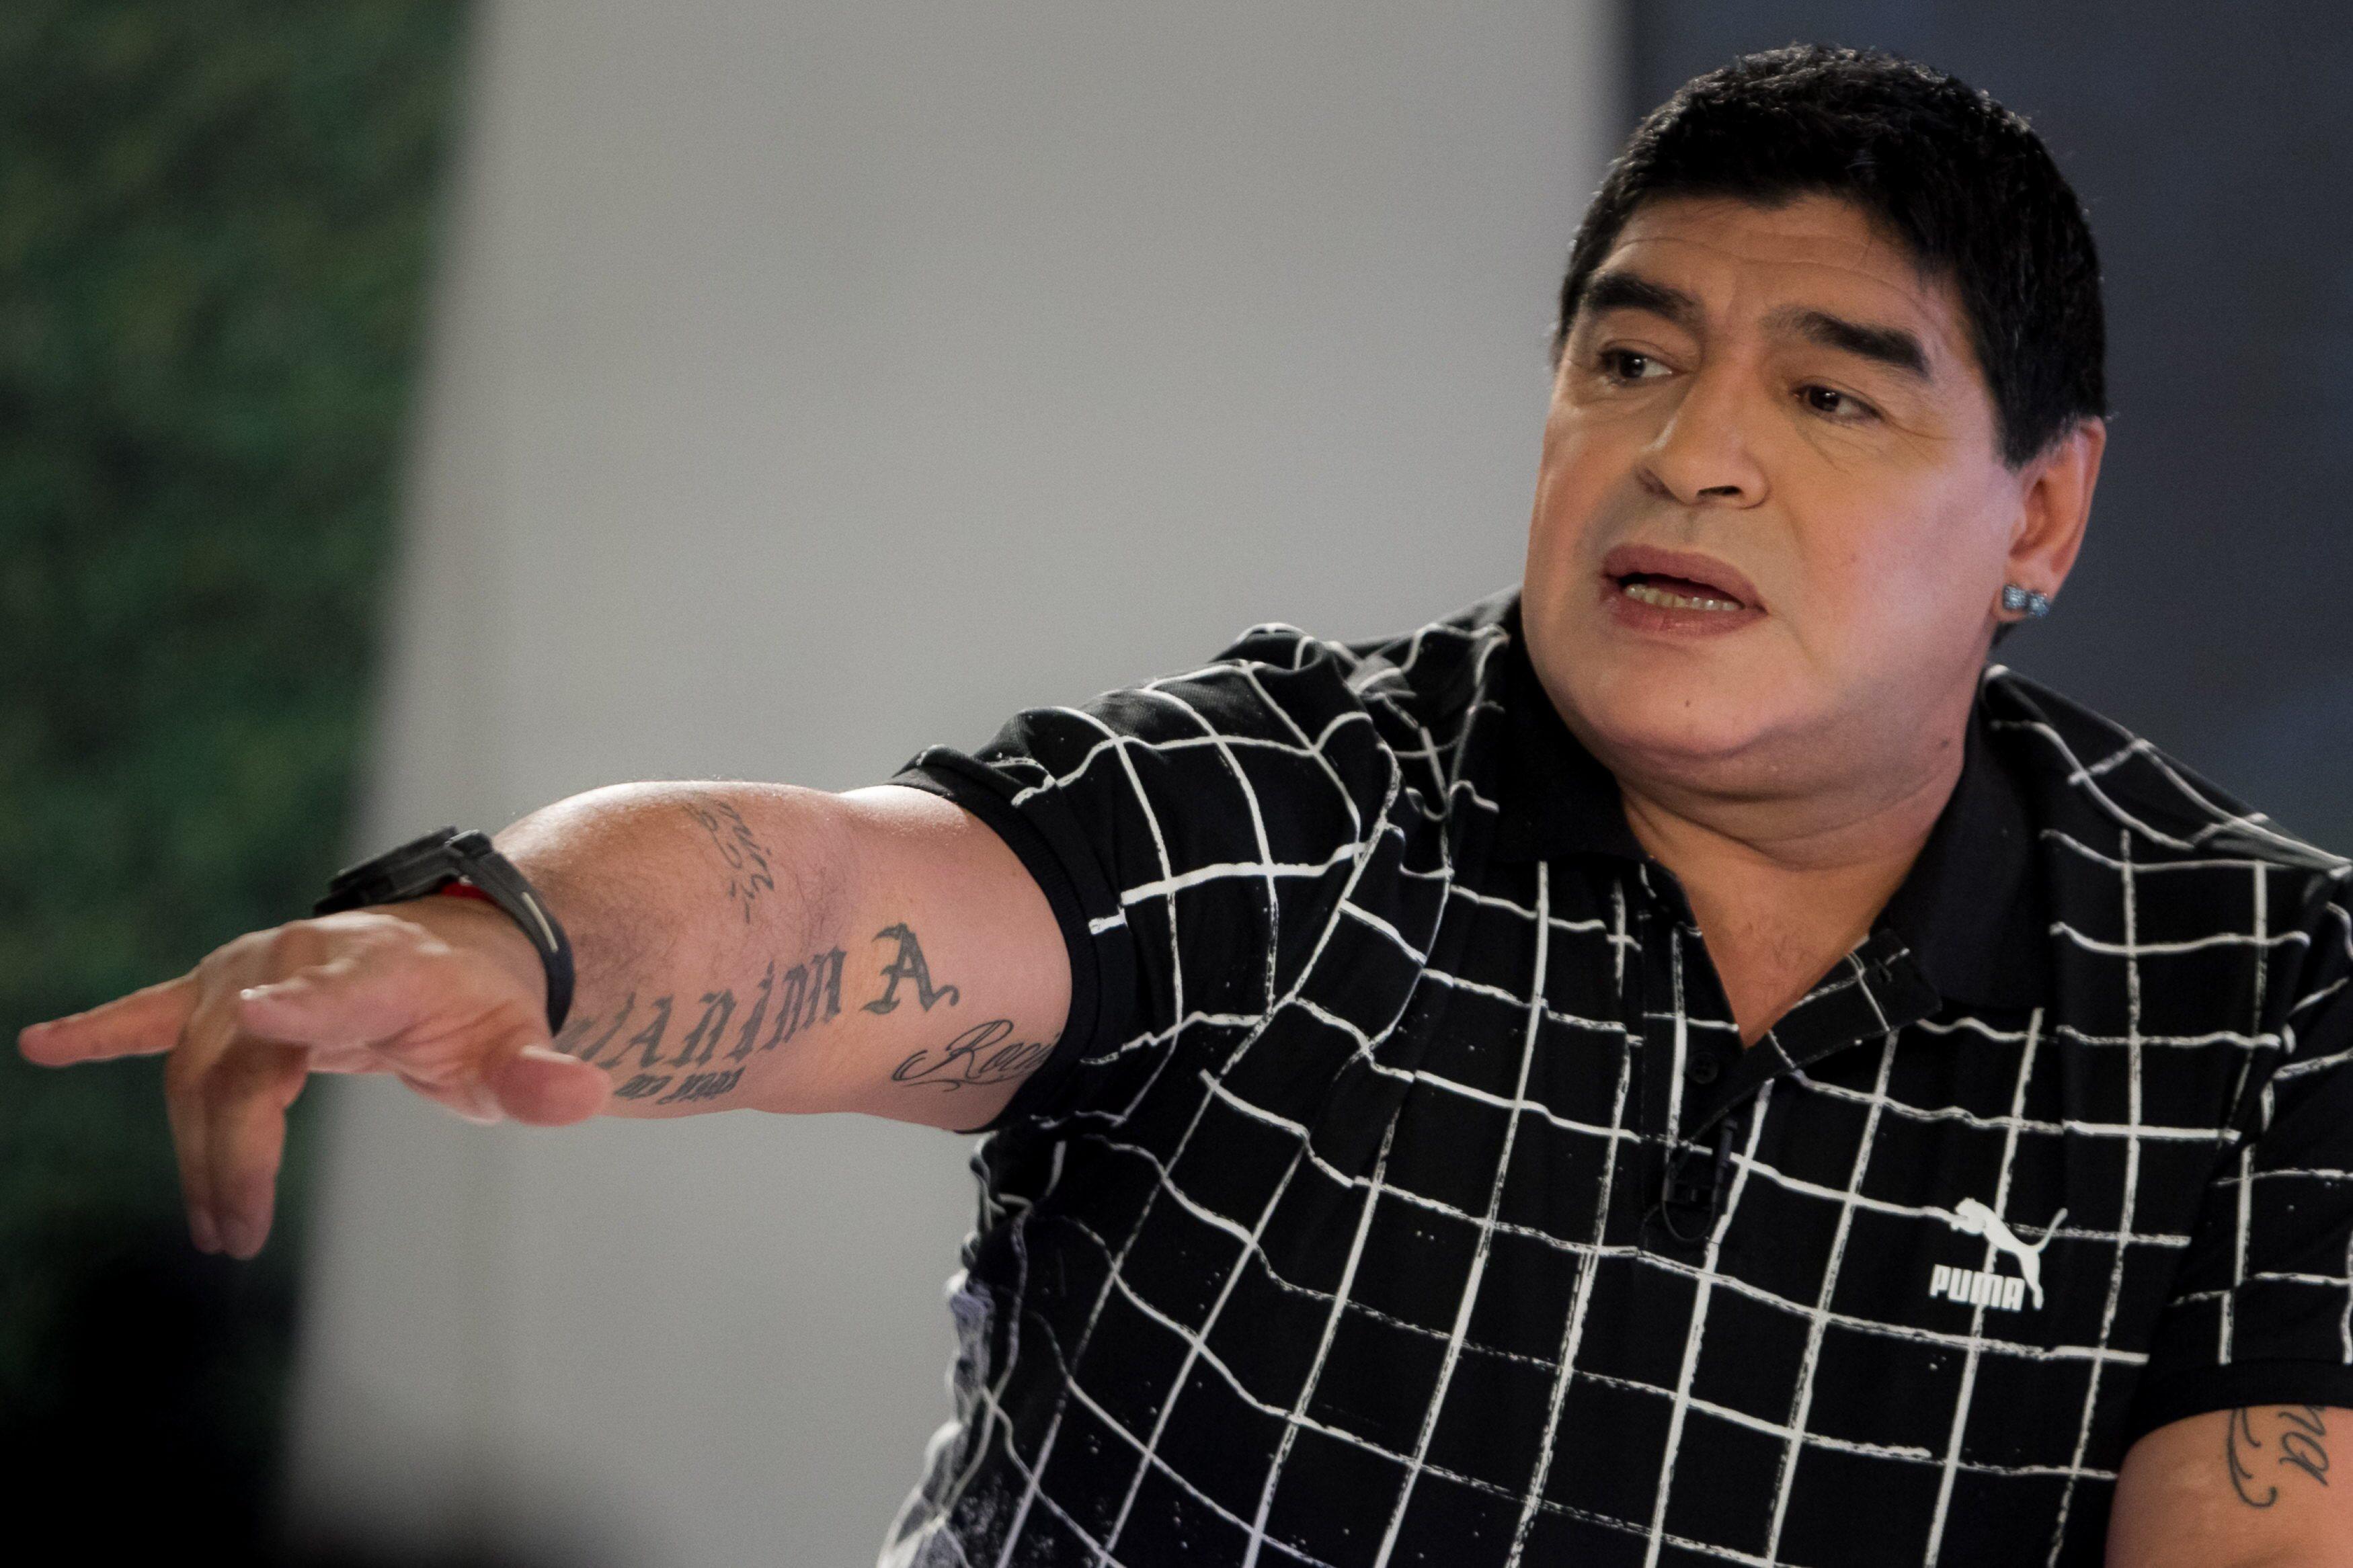 Grémio vs. Real Madrid? Maradona aposta na equipa brasileira